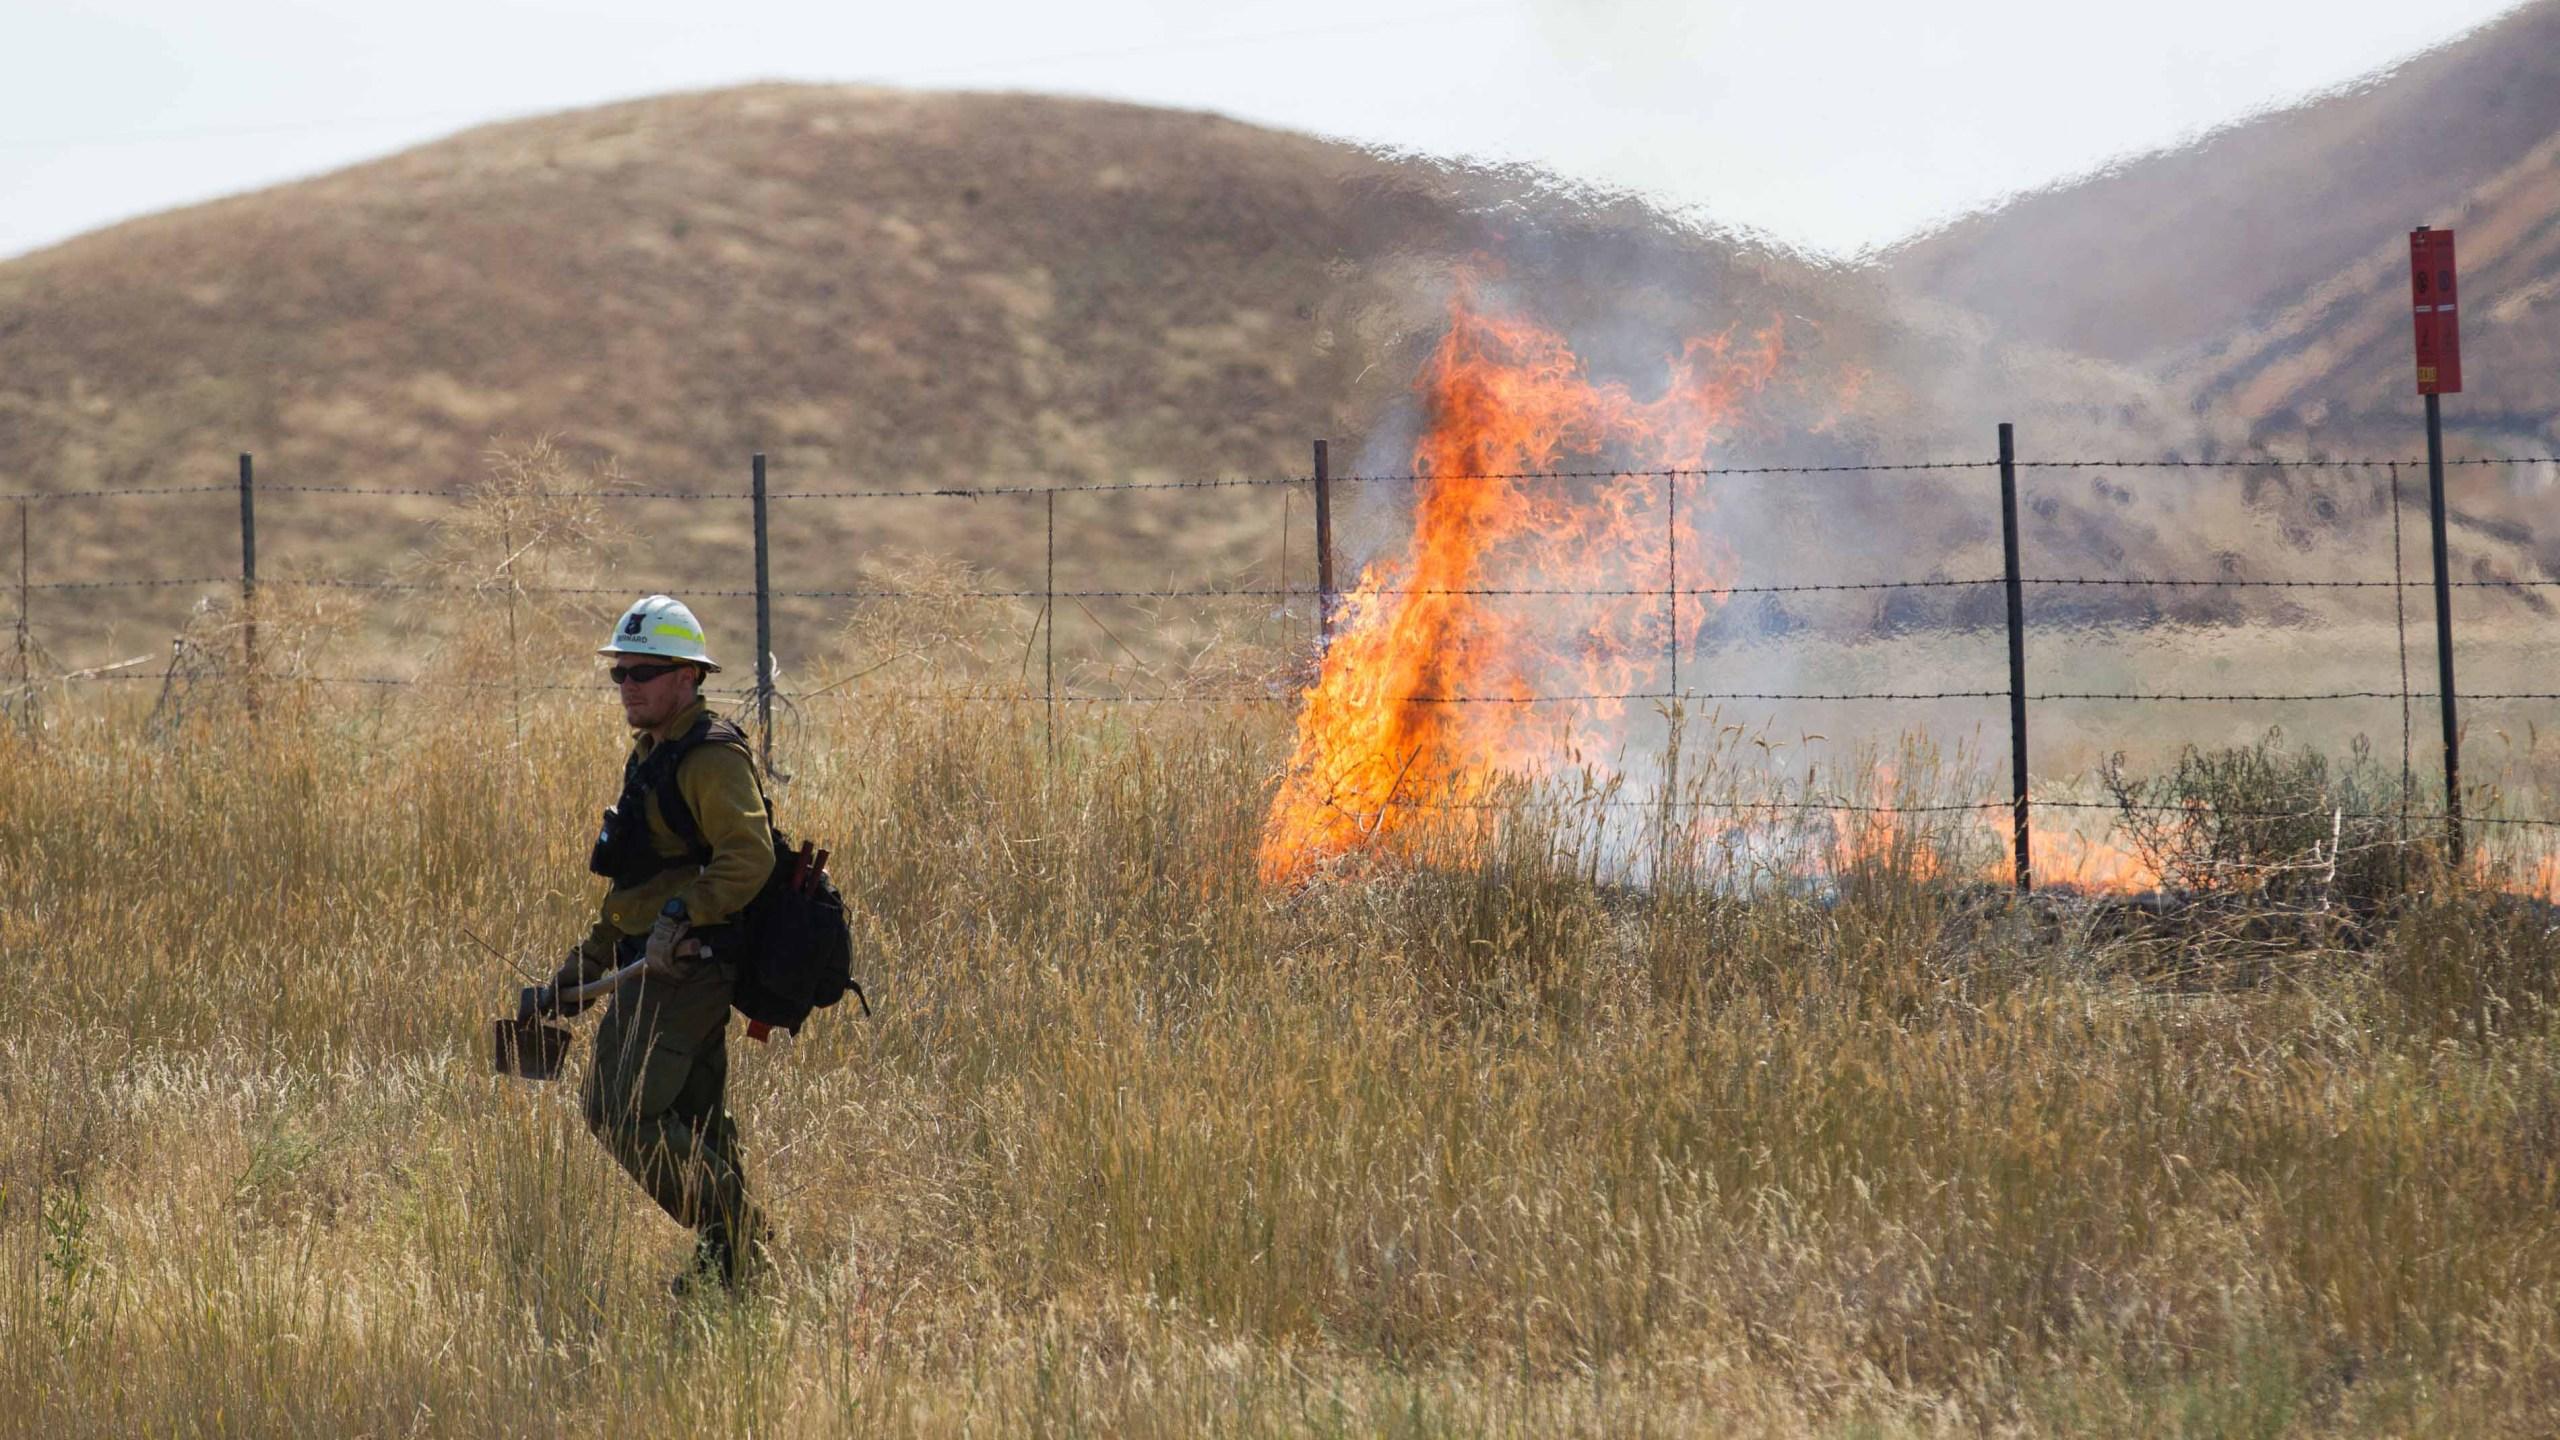 Western Wildfires_338495